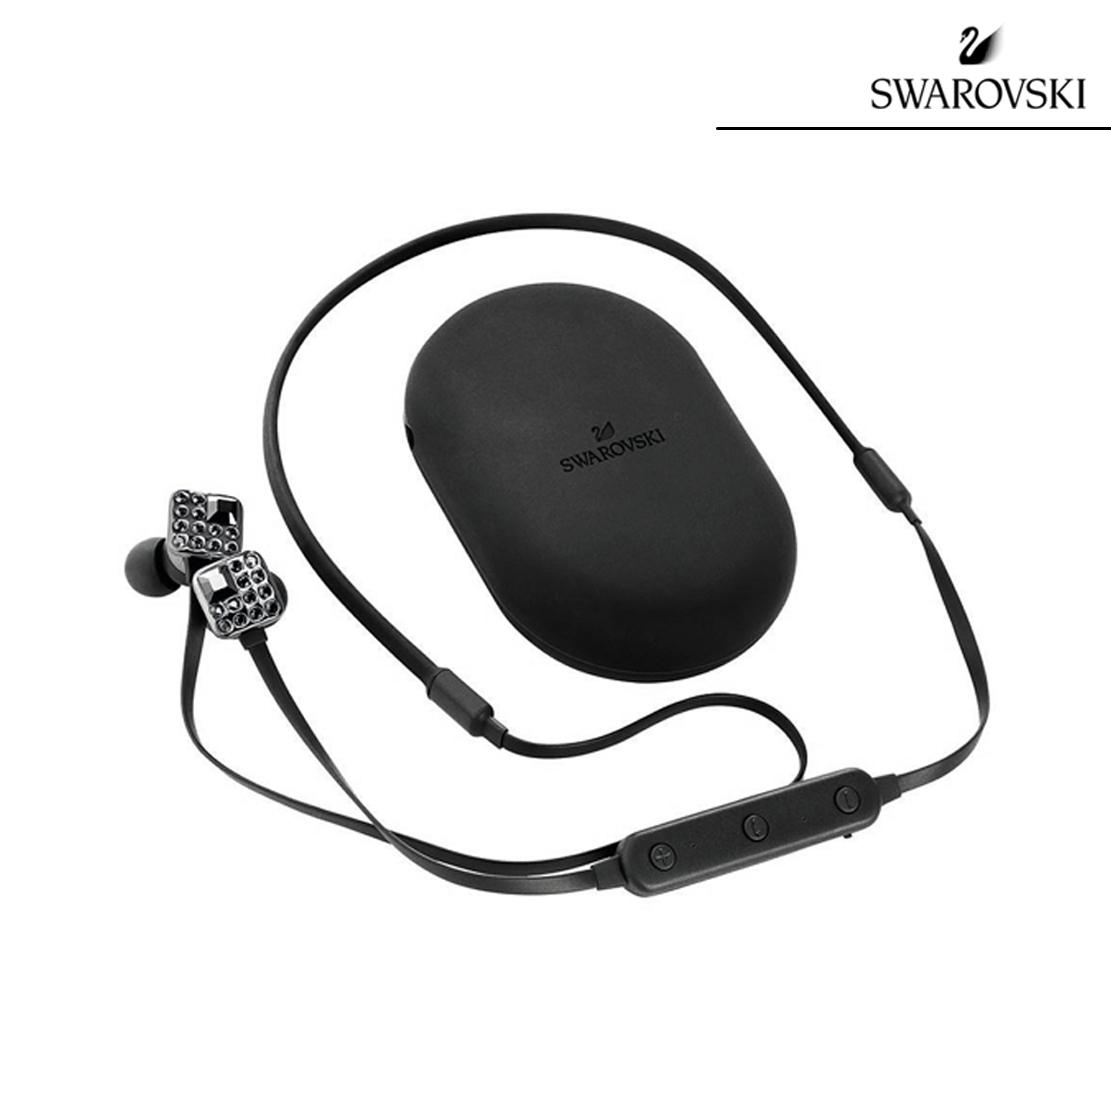 Fone Square Bluetooth Swarovski